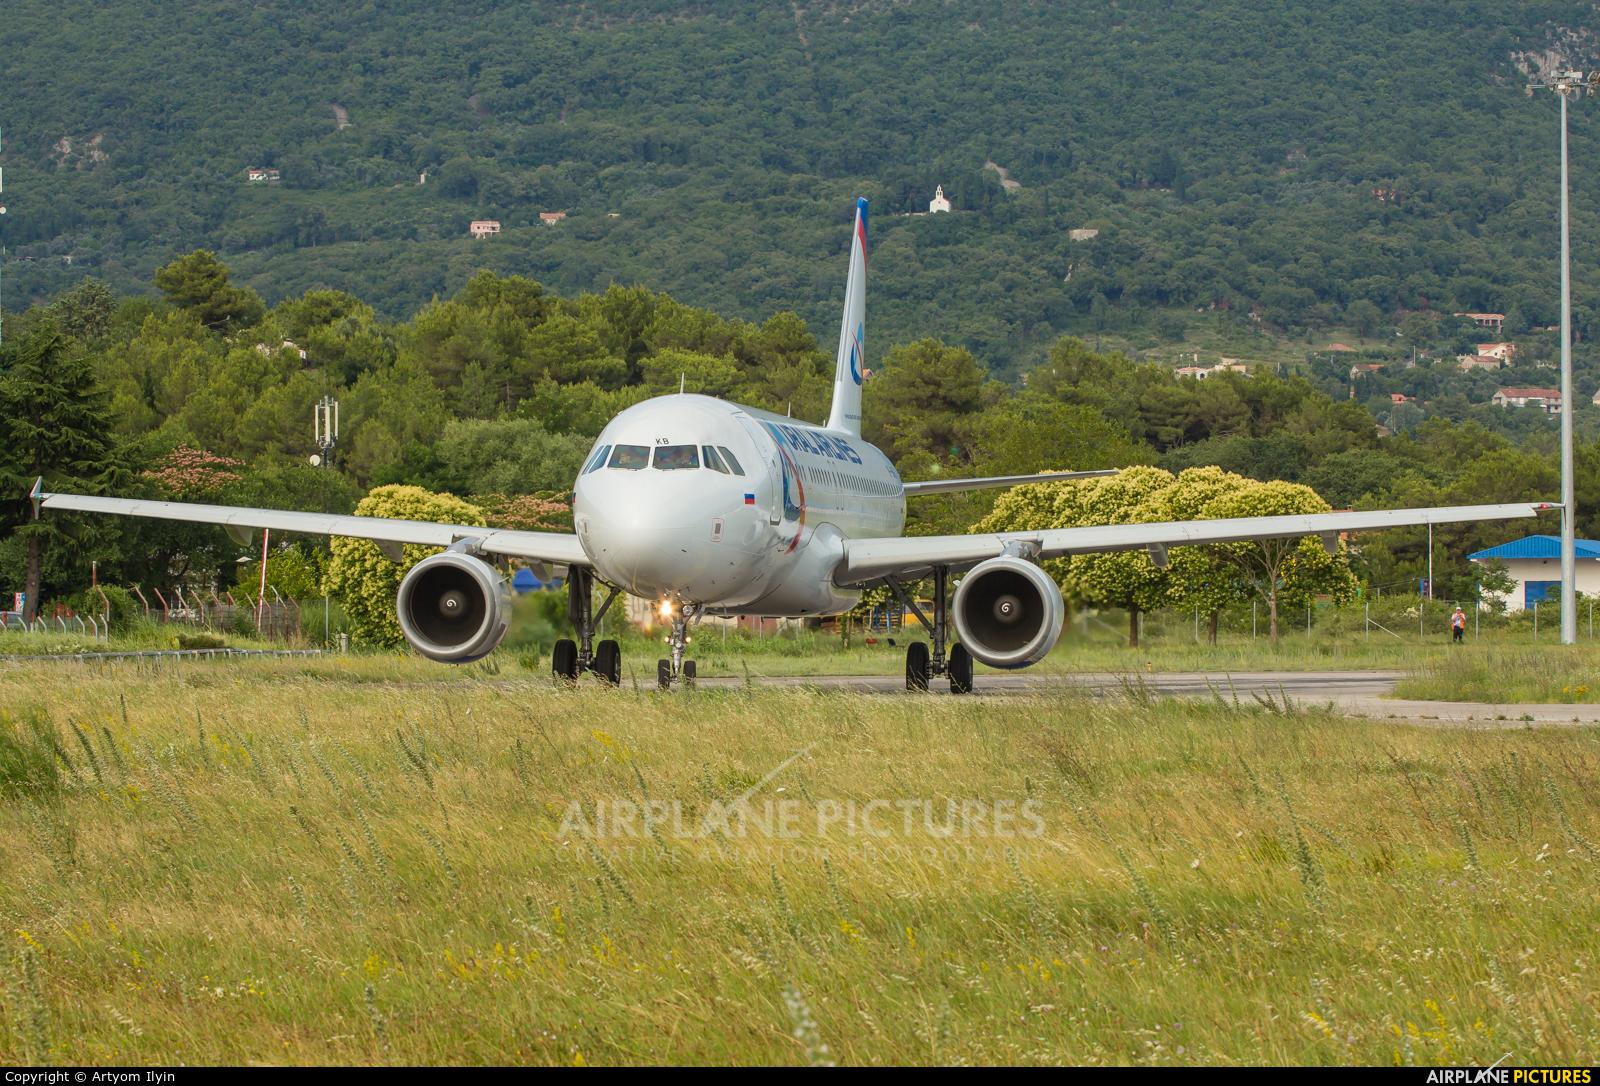 Ural Airlines VP-BKB aircraft at Tivat